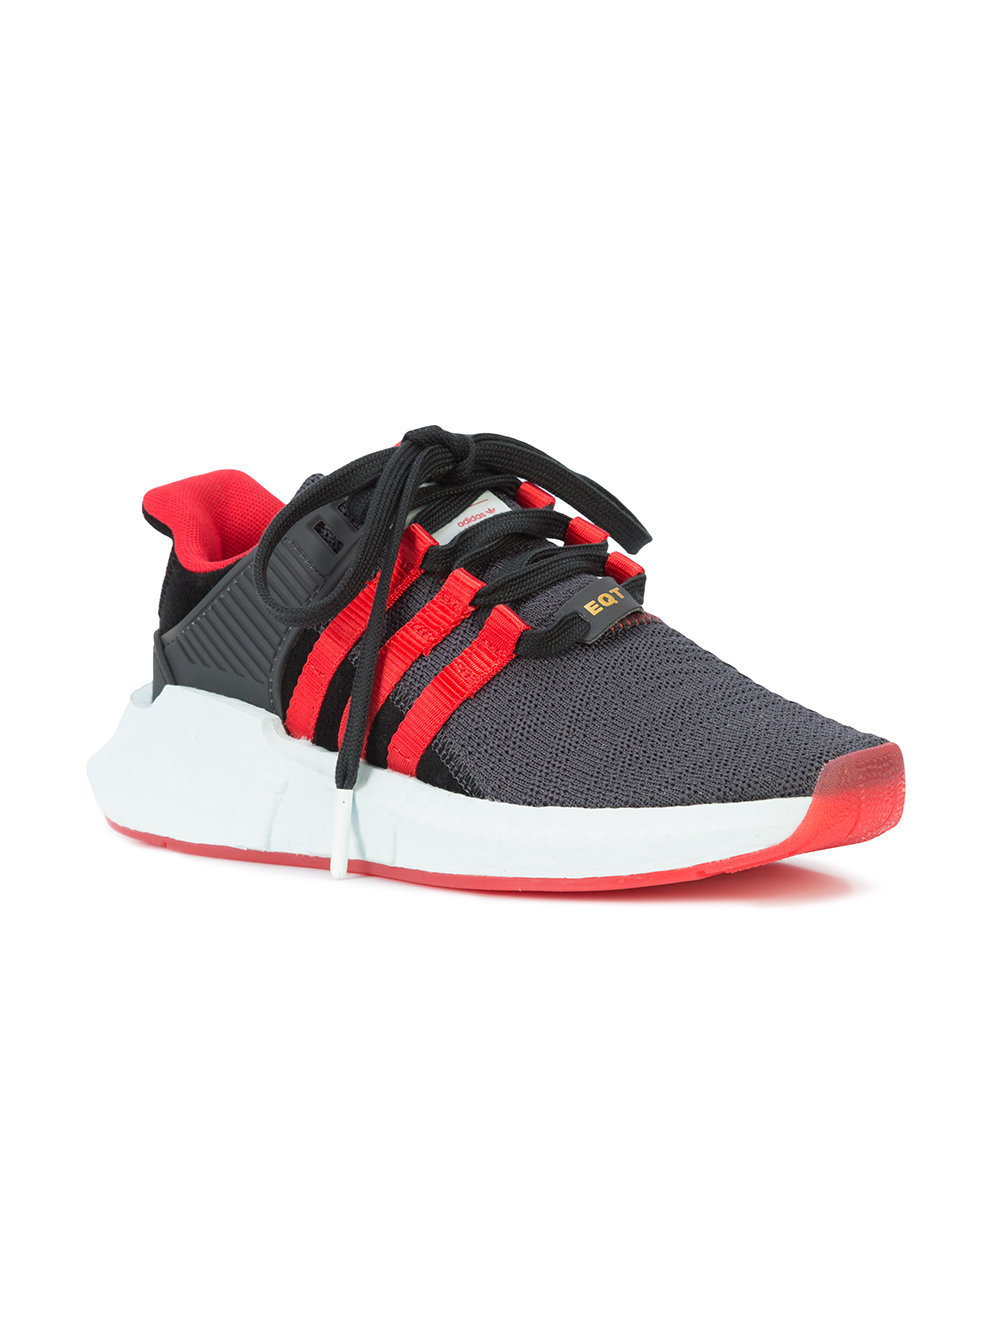 online retailer 3dd51 b4e5e ... adidas Eqt Support 9317 Yuanxiao Sneakers ...